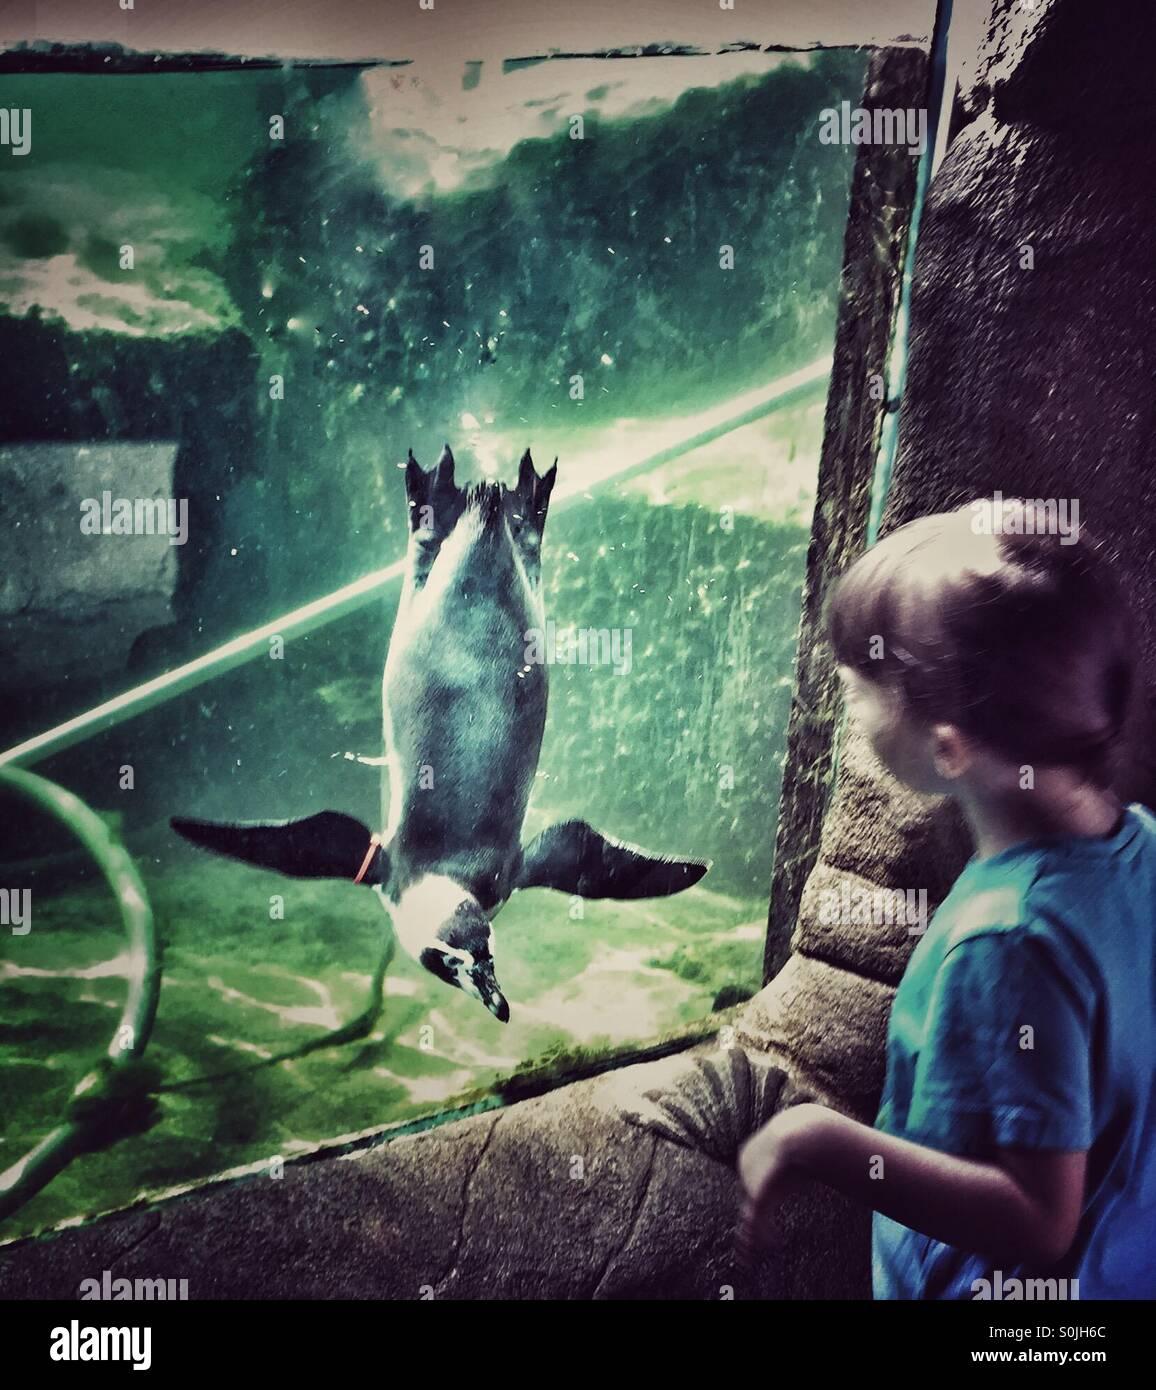 Child watching penguin watching child - Stock Image